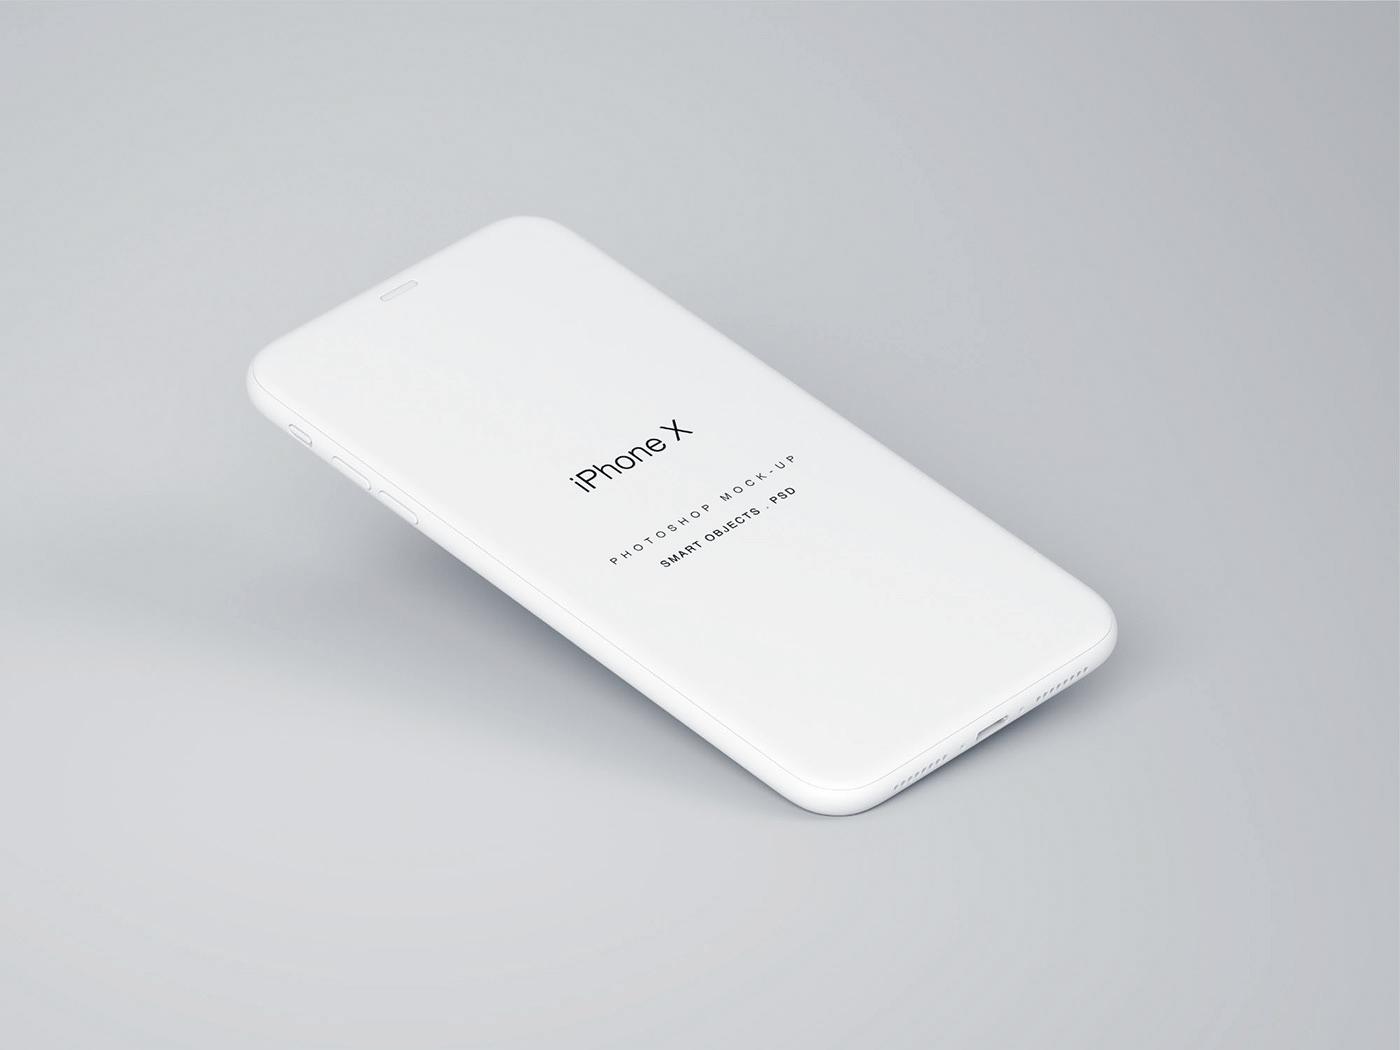 Мокап парящего iPhone X. perspective iphone x mockup